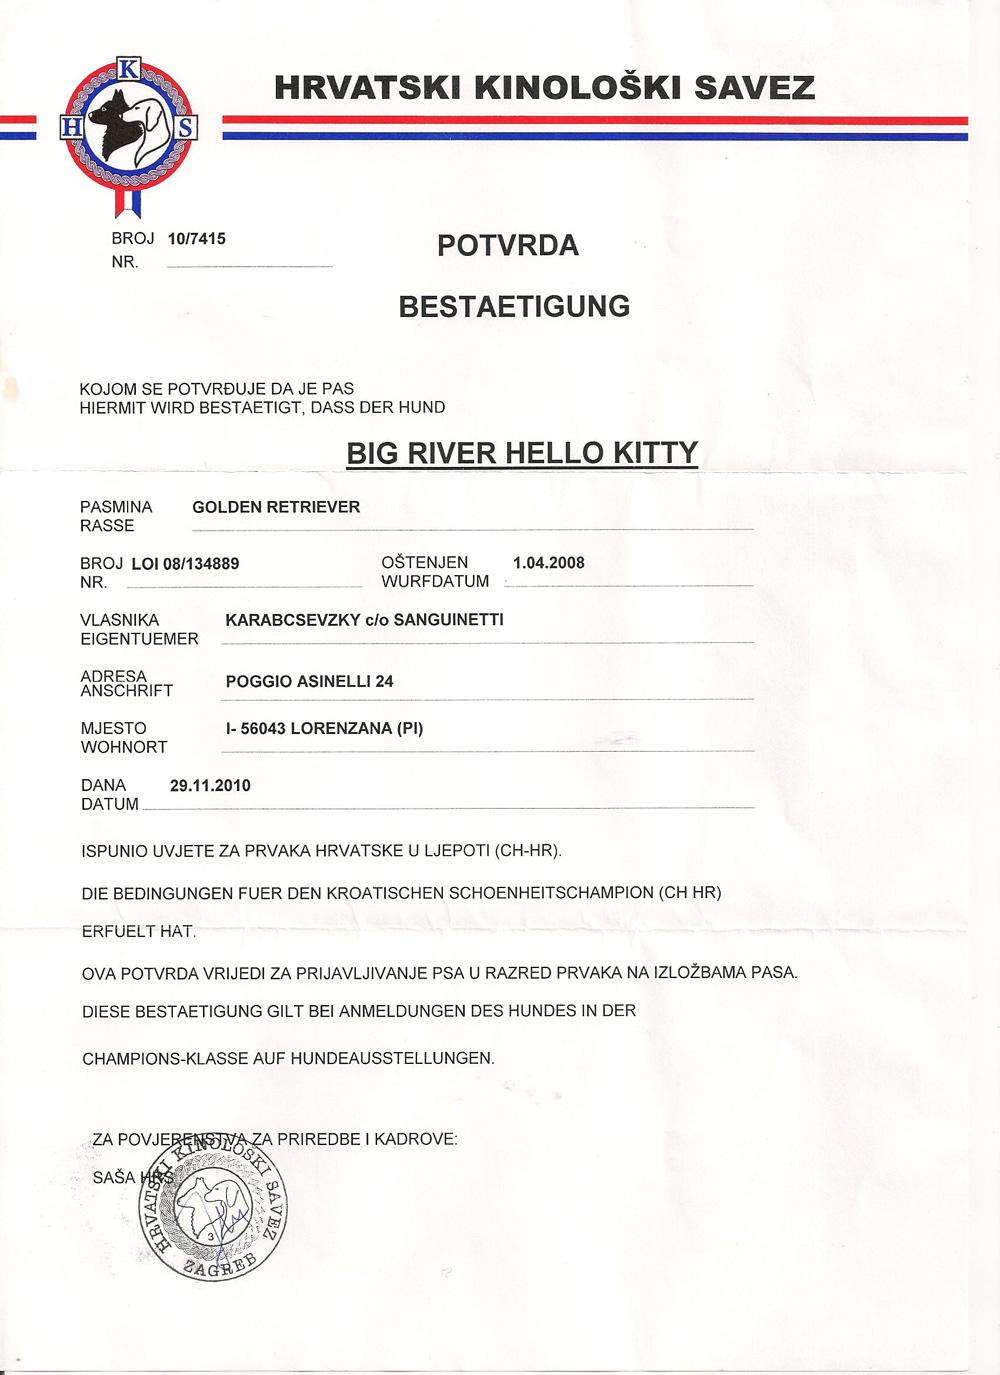 Diploma-Kitty-Croazia-Big-River-2010